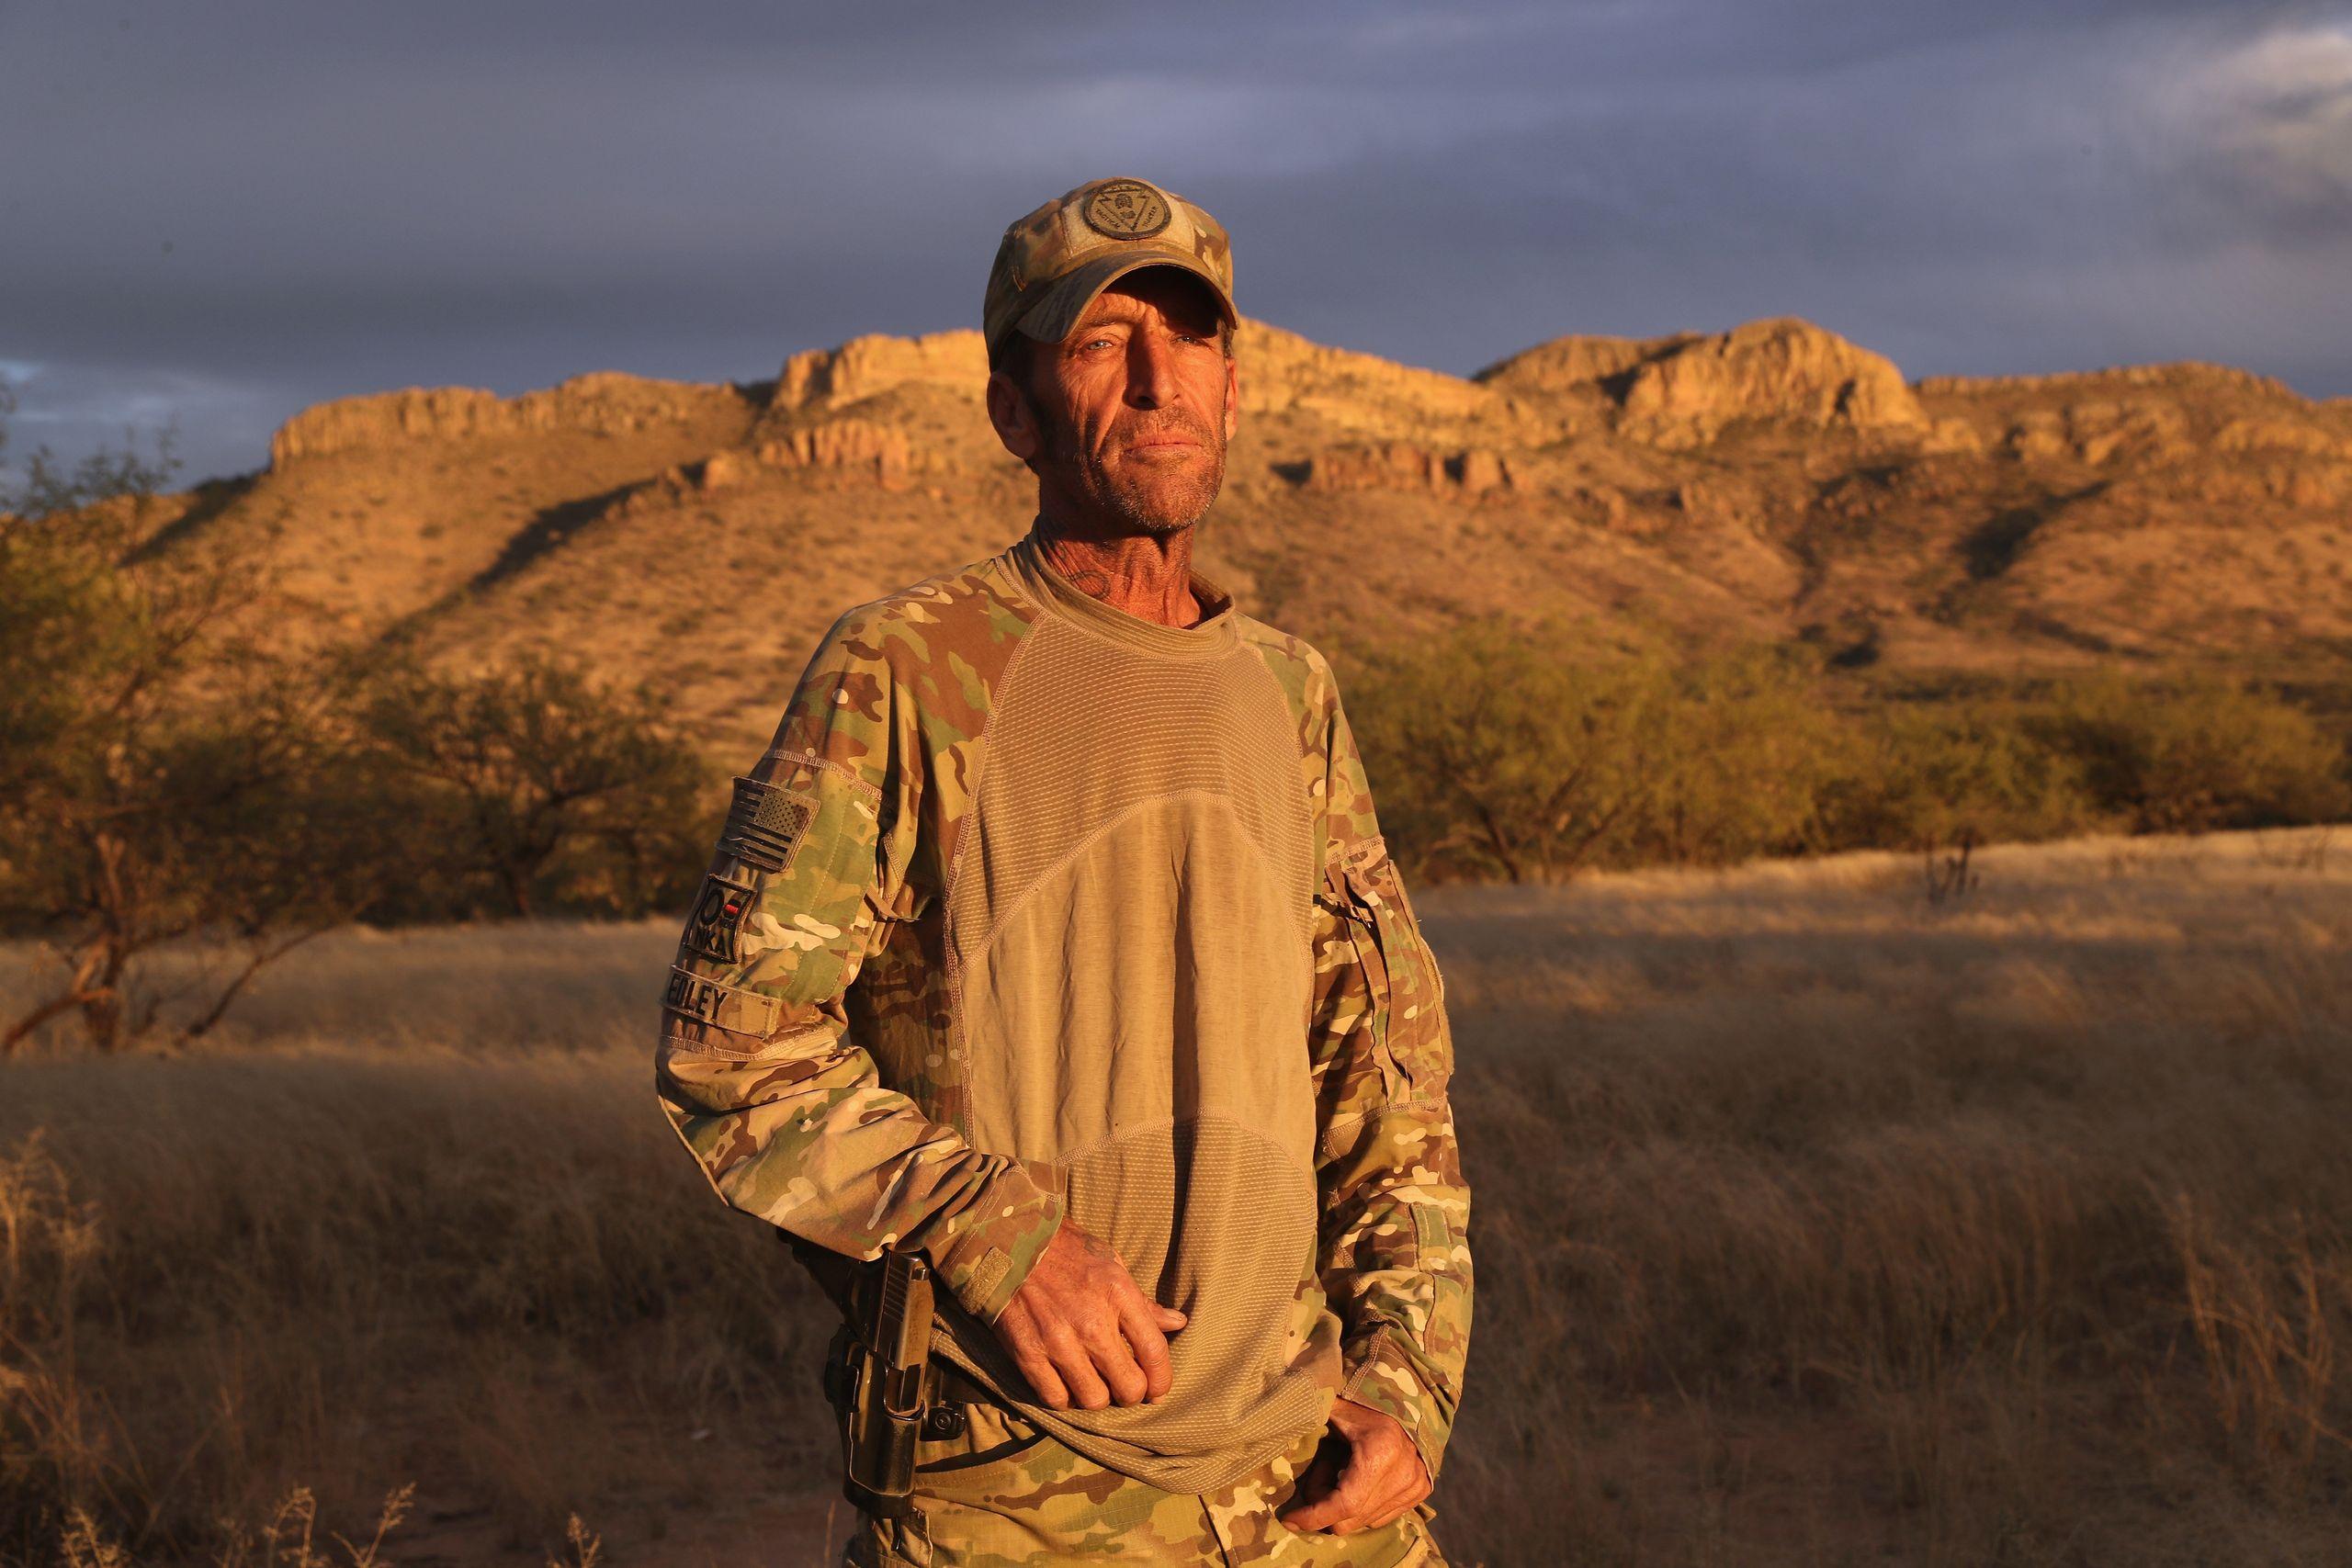 Tim Foley stands in camp near the U.S.-Mexico border onNov. 16, 2016, in Pima County, Arizona.